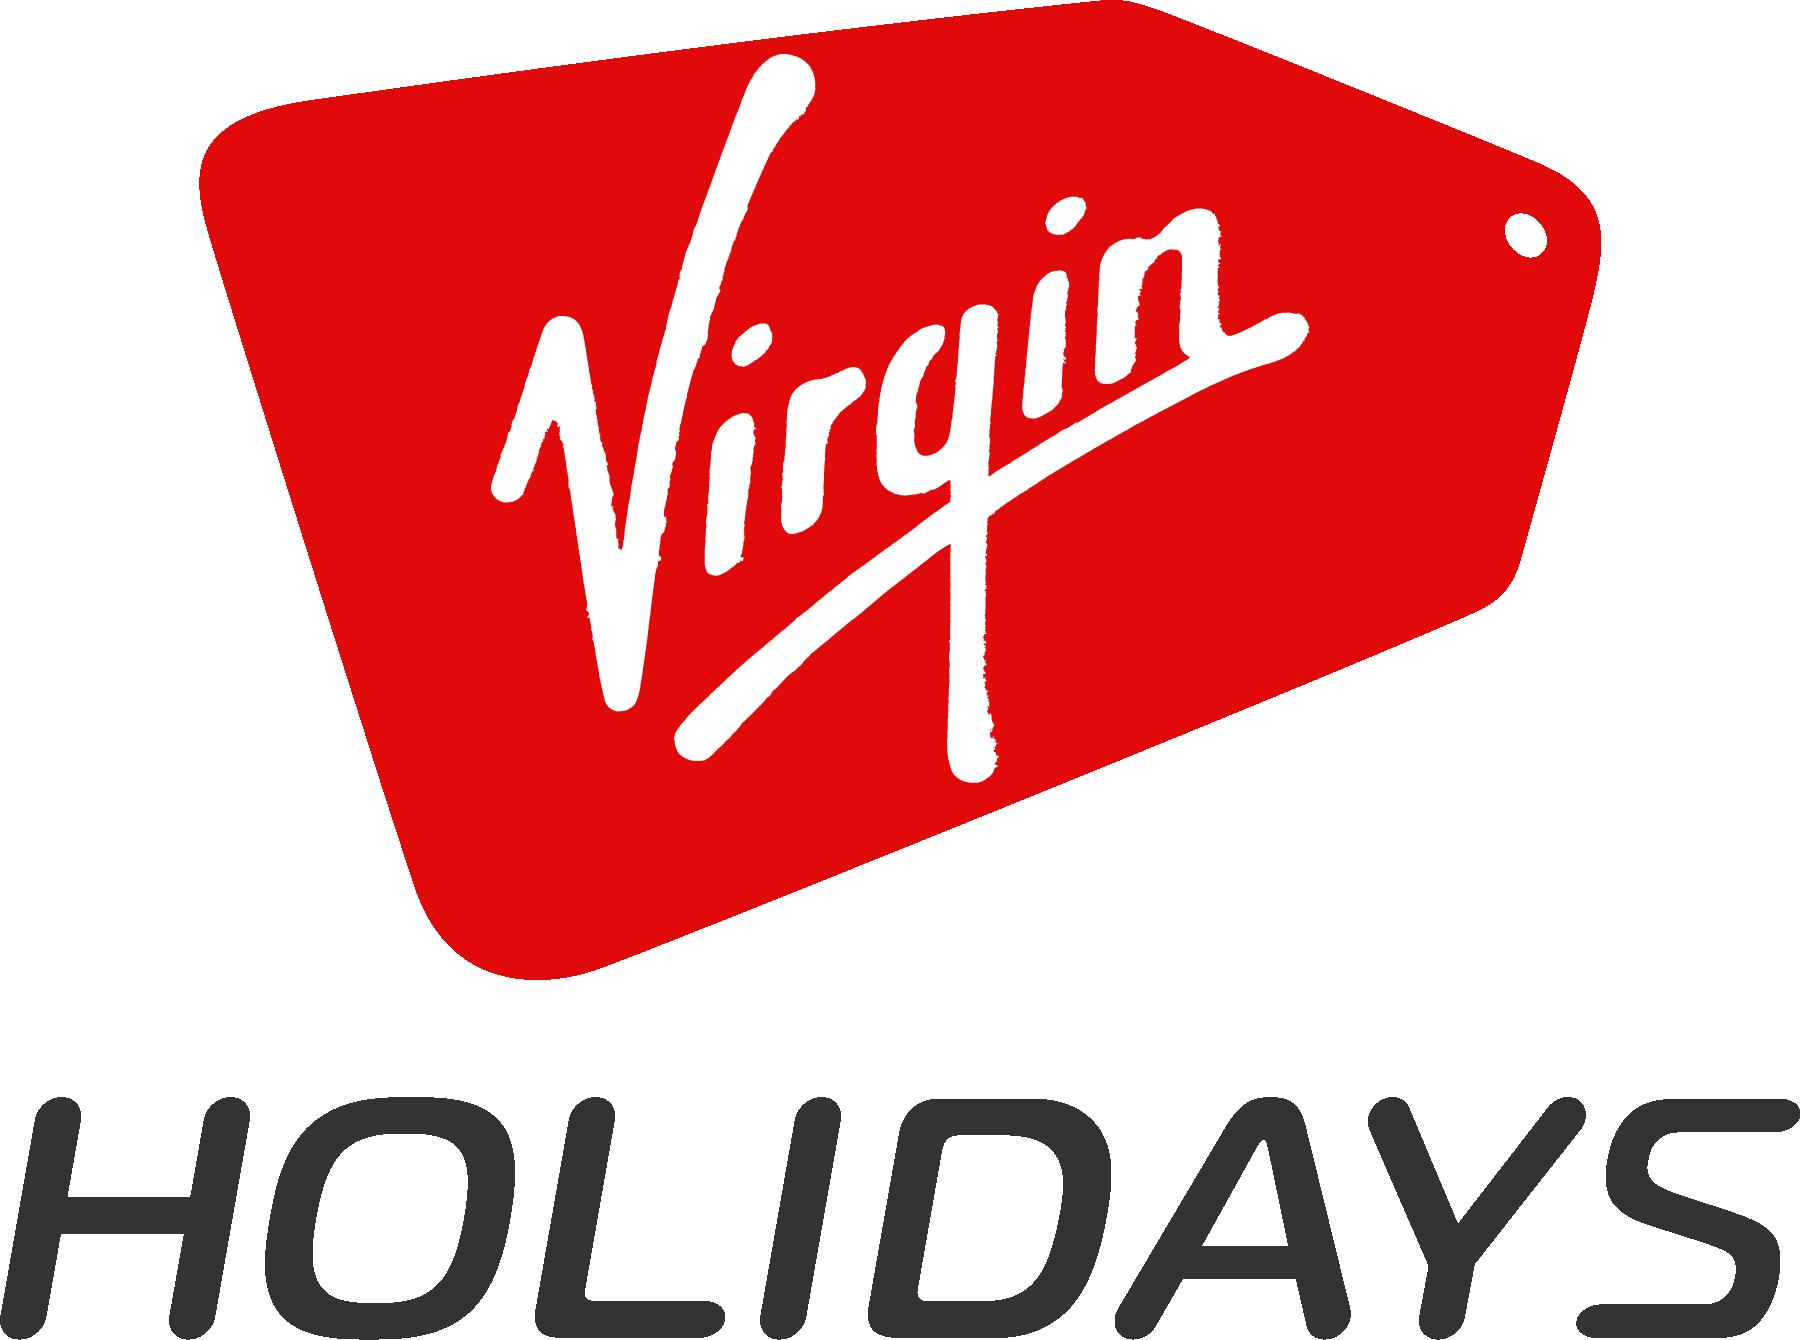 Virgin Holidays at Debenhams, Leeds